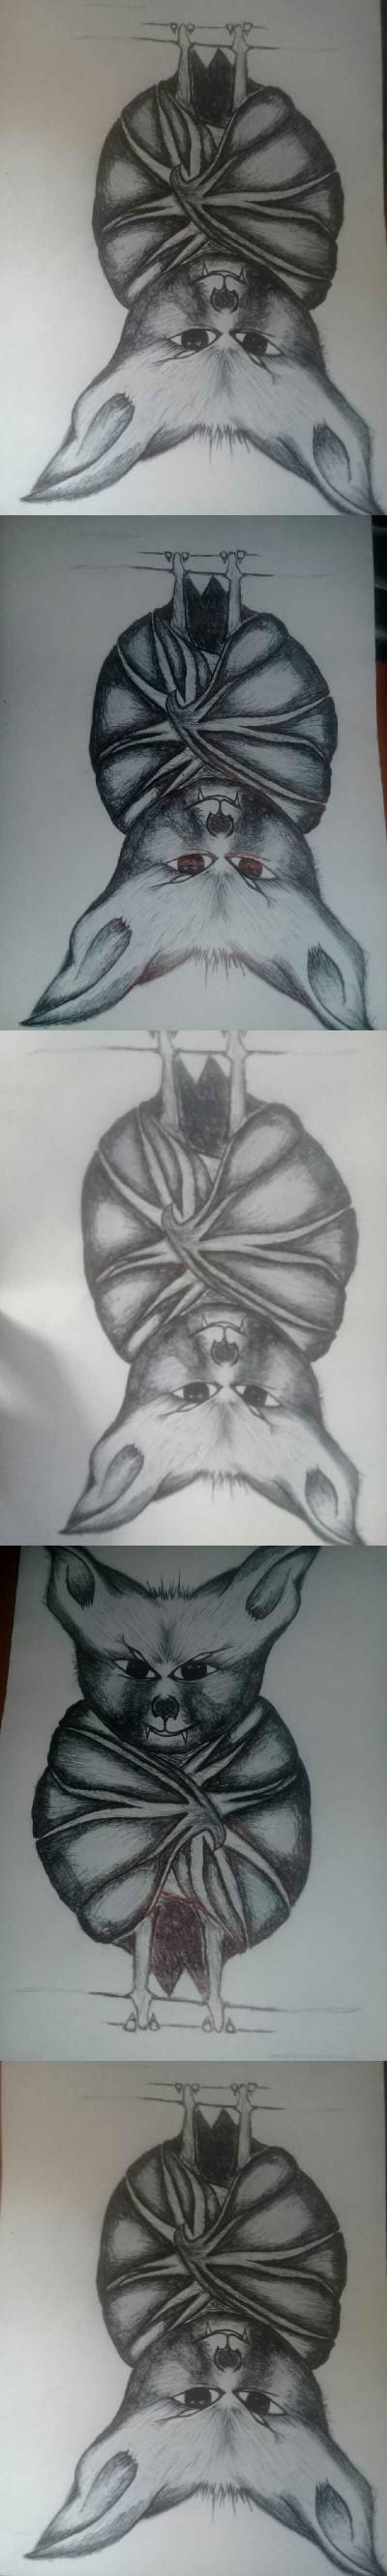 Animal Digital Drawing | Emelia | PENUP